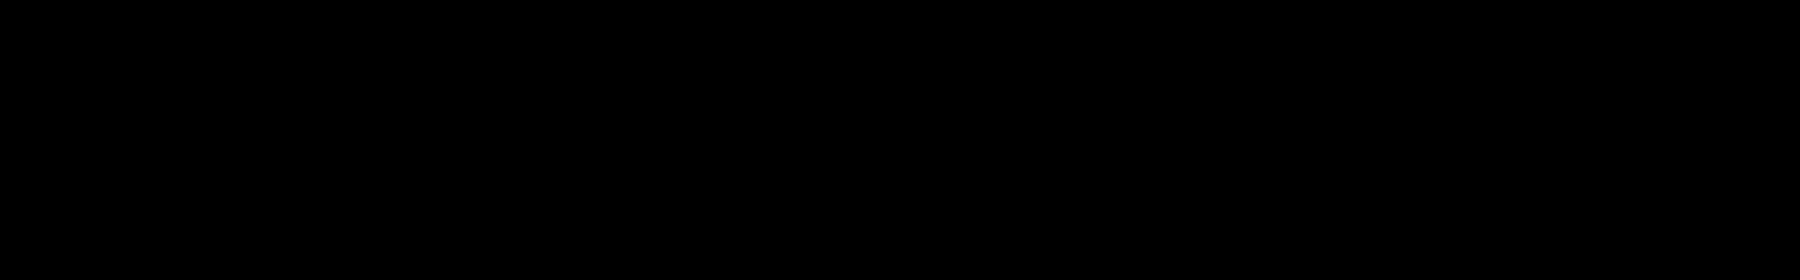 Yokaze - Serum Presets audio waveform